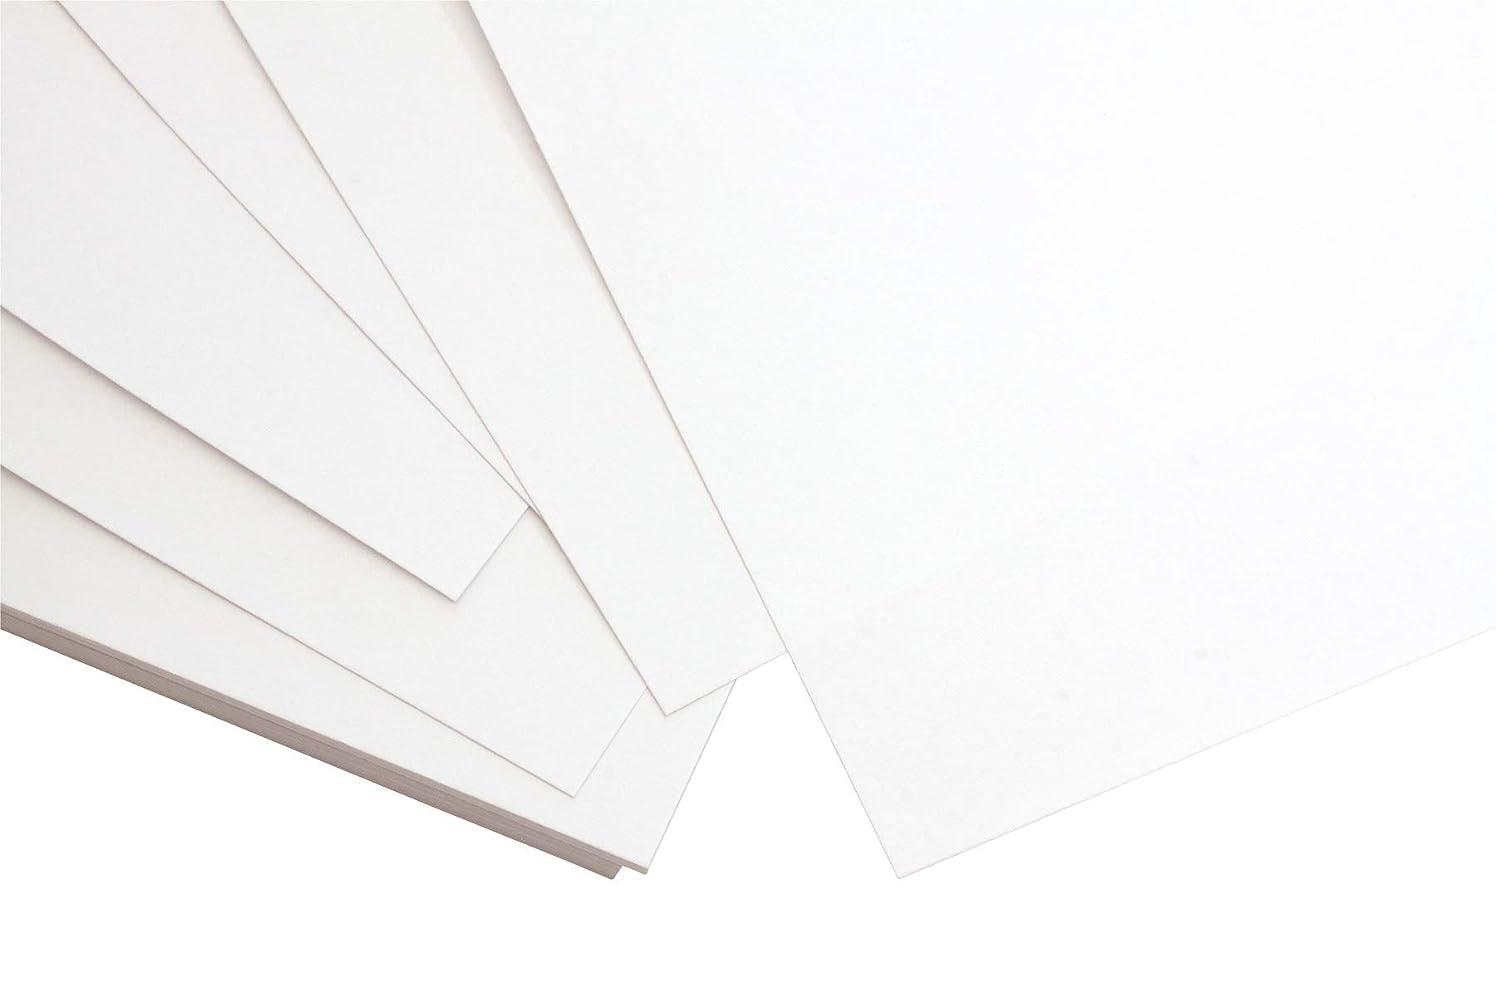 Jack Richeson 100802 60# Bulk Drawing Paper 12x18 800 Sheets